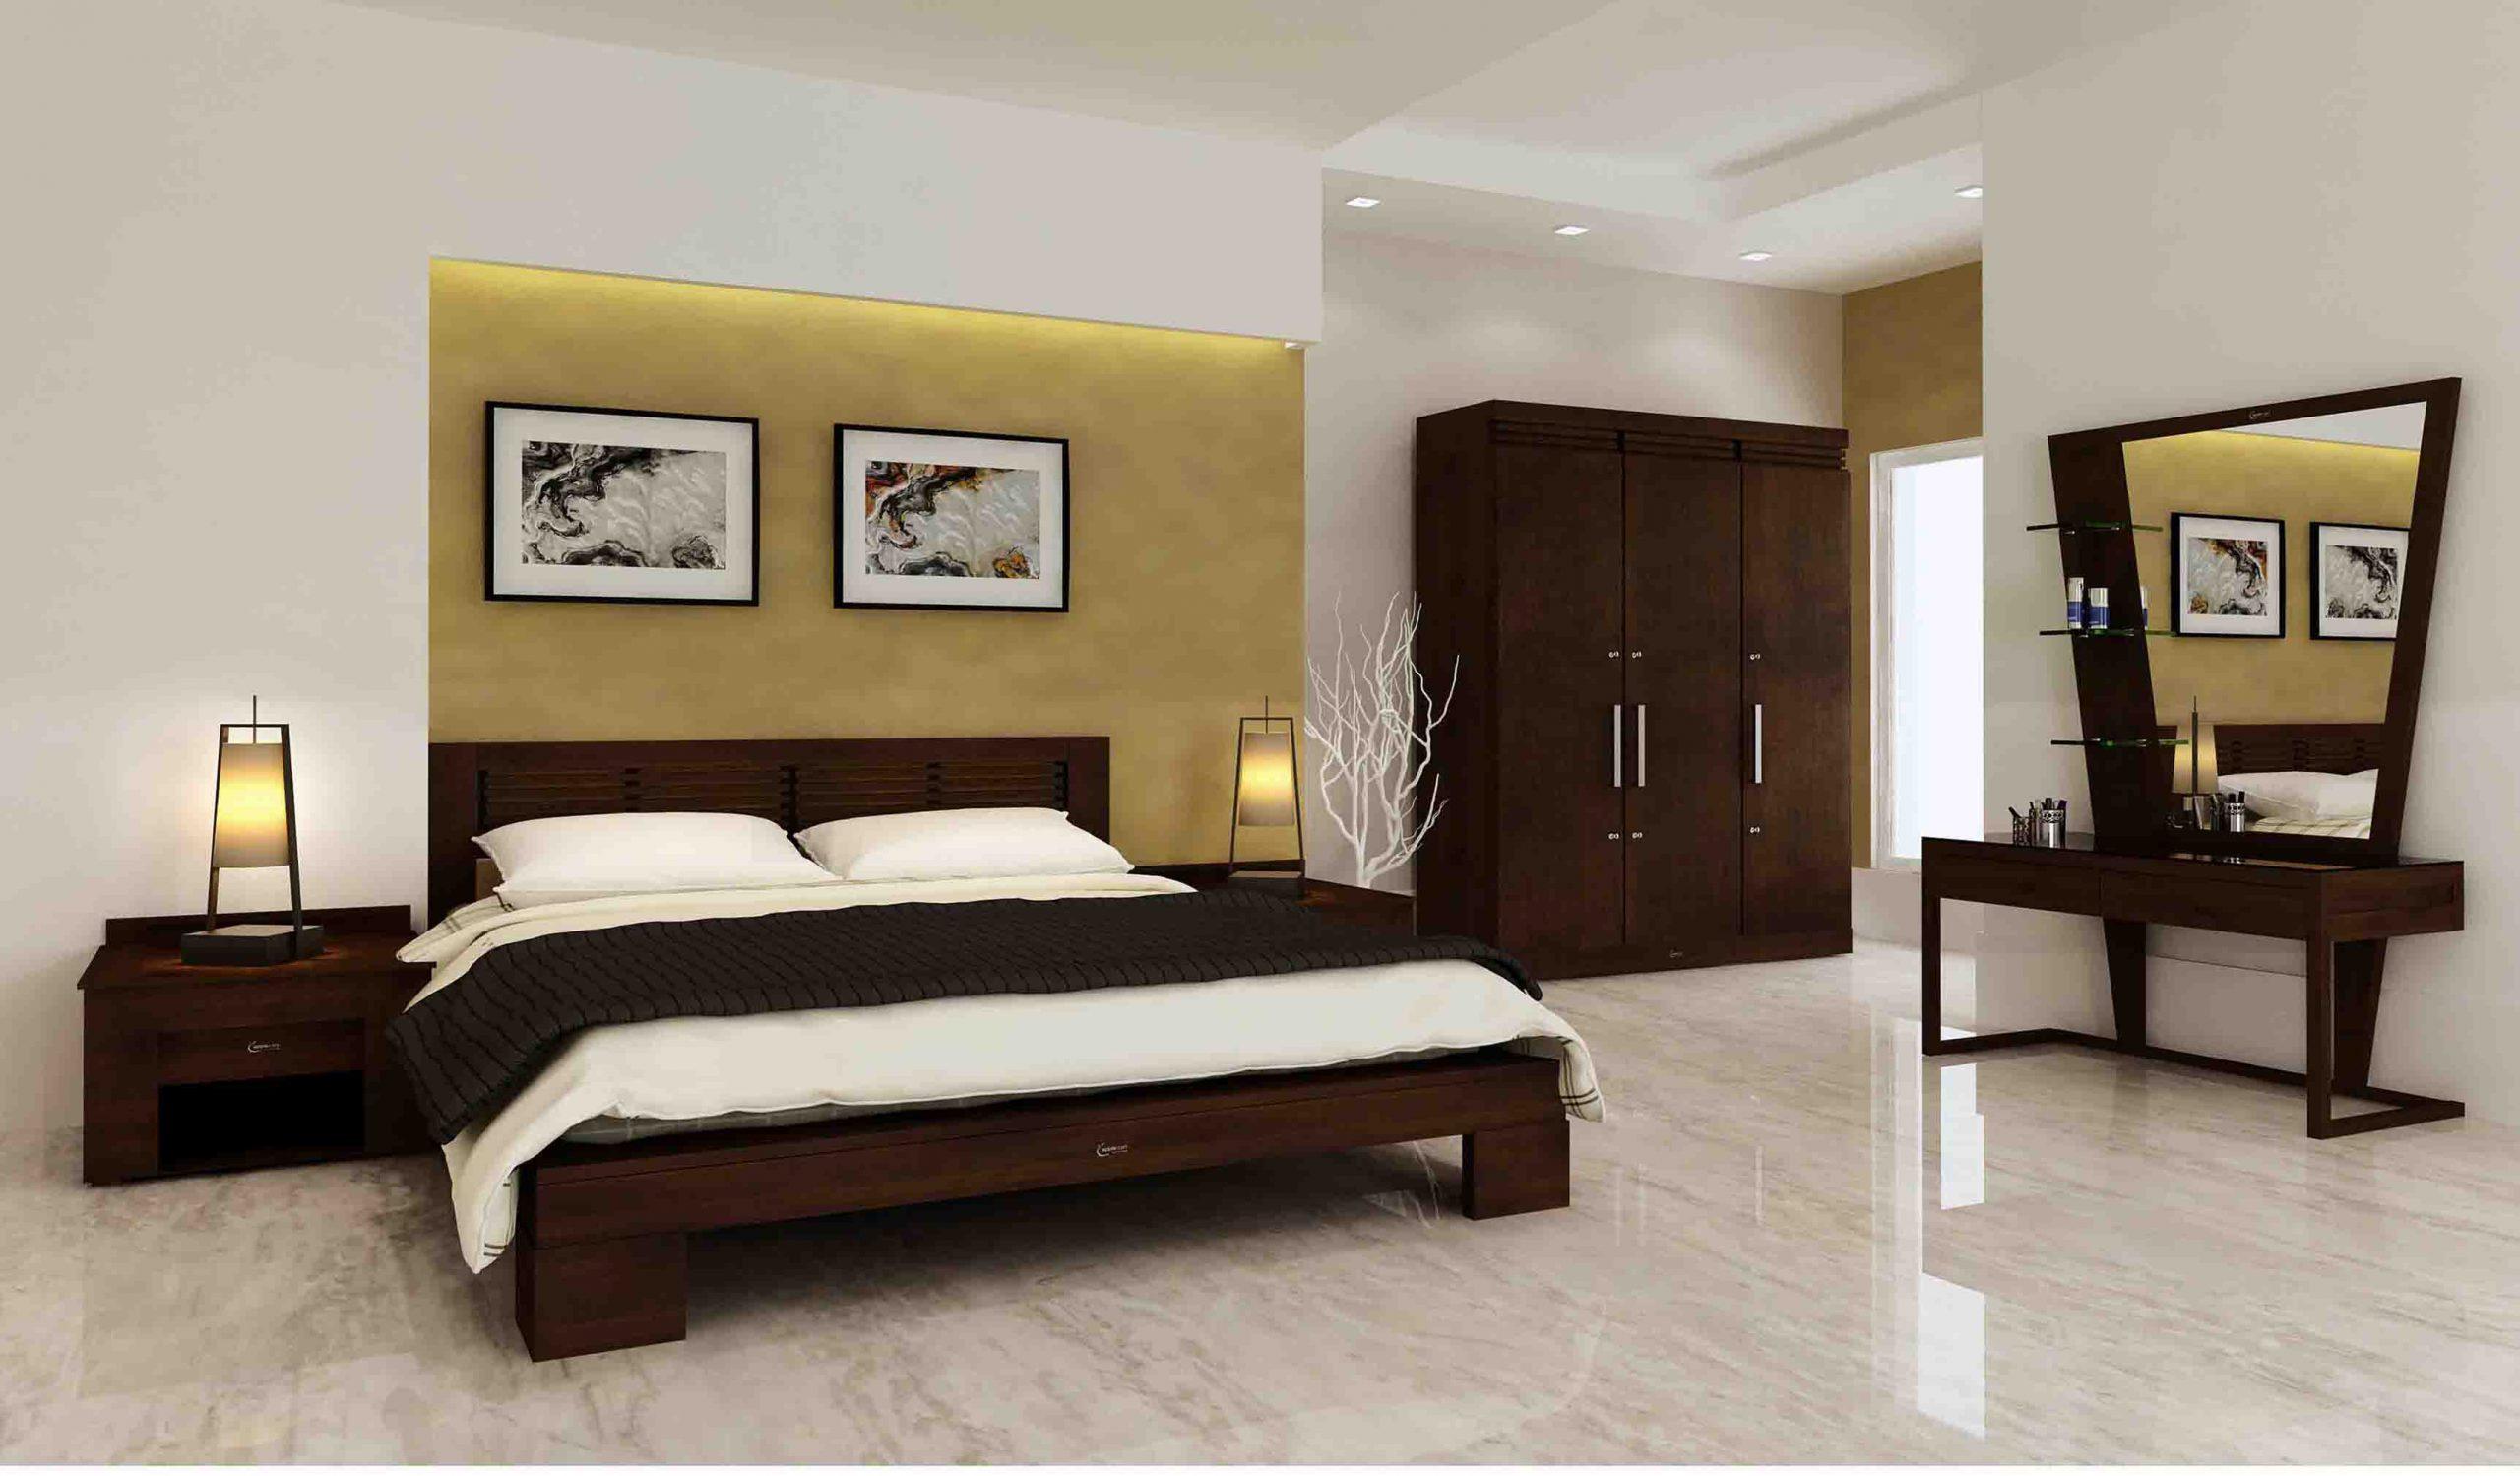 Bedroom furnitues in kerala